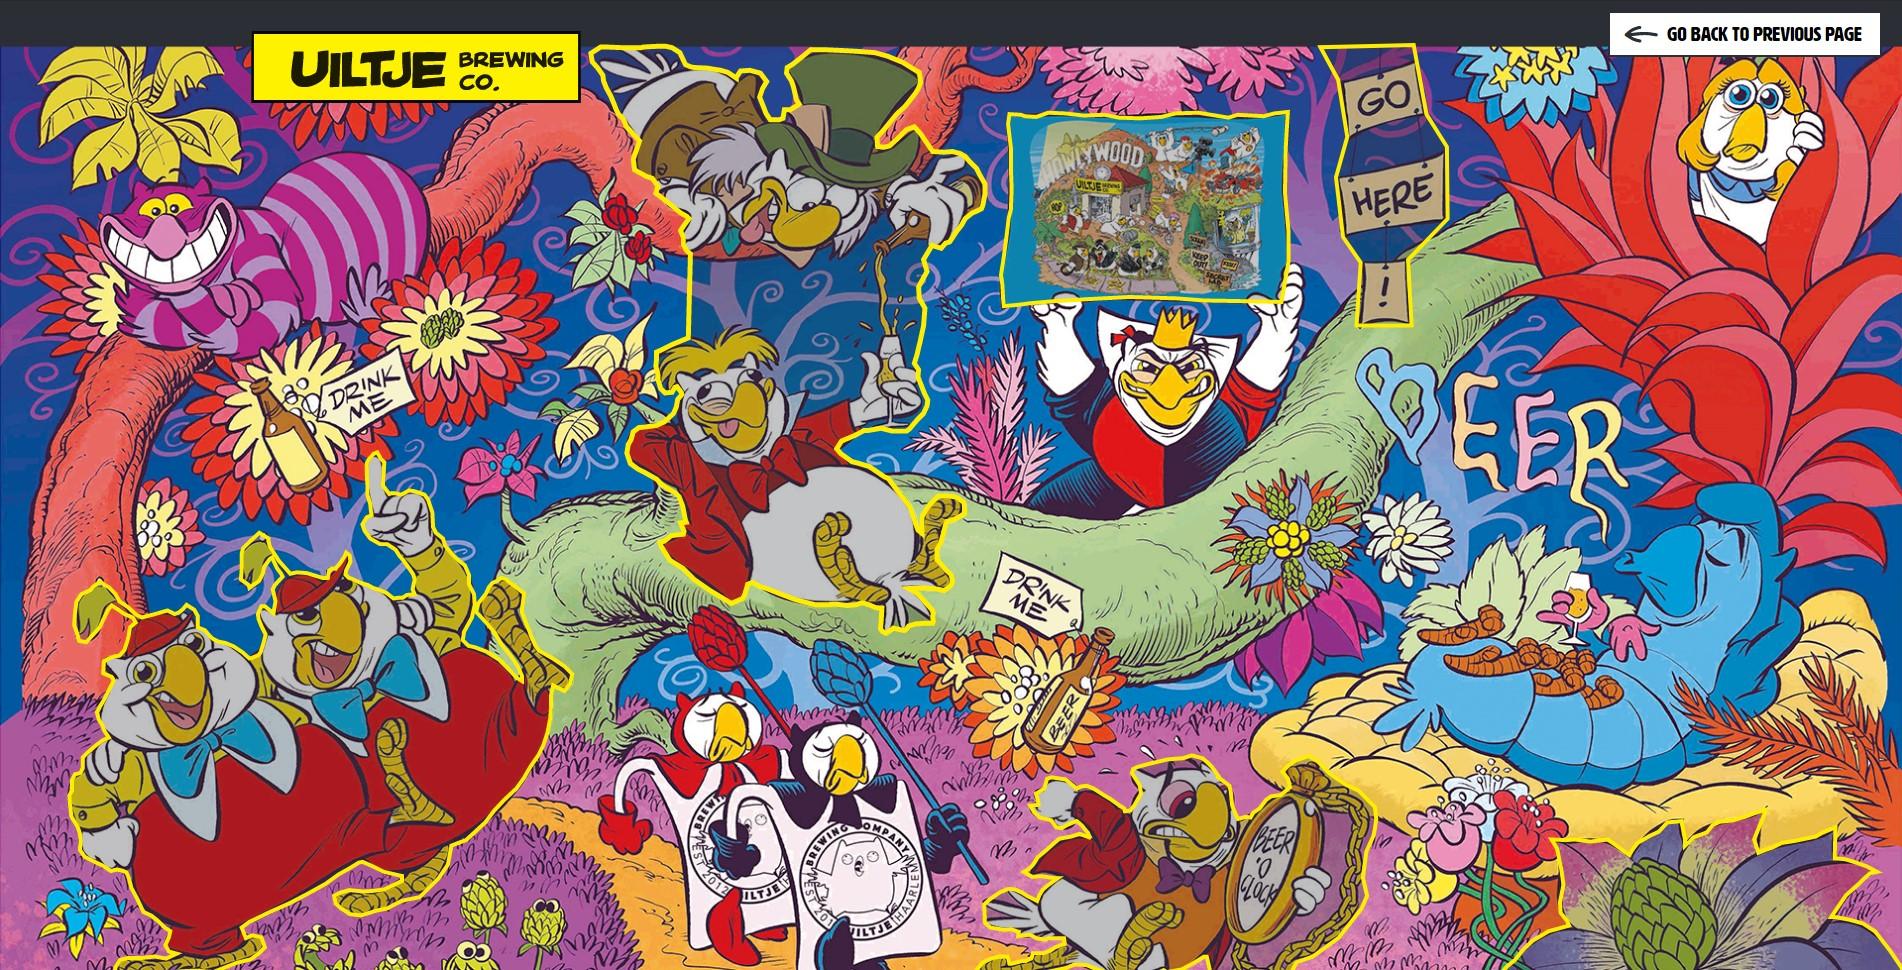 Open our world Alice in Wonderland